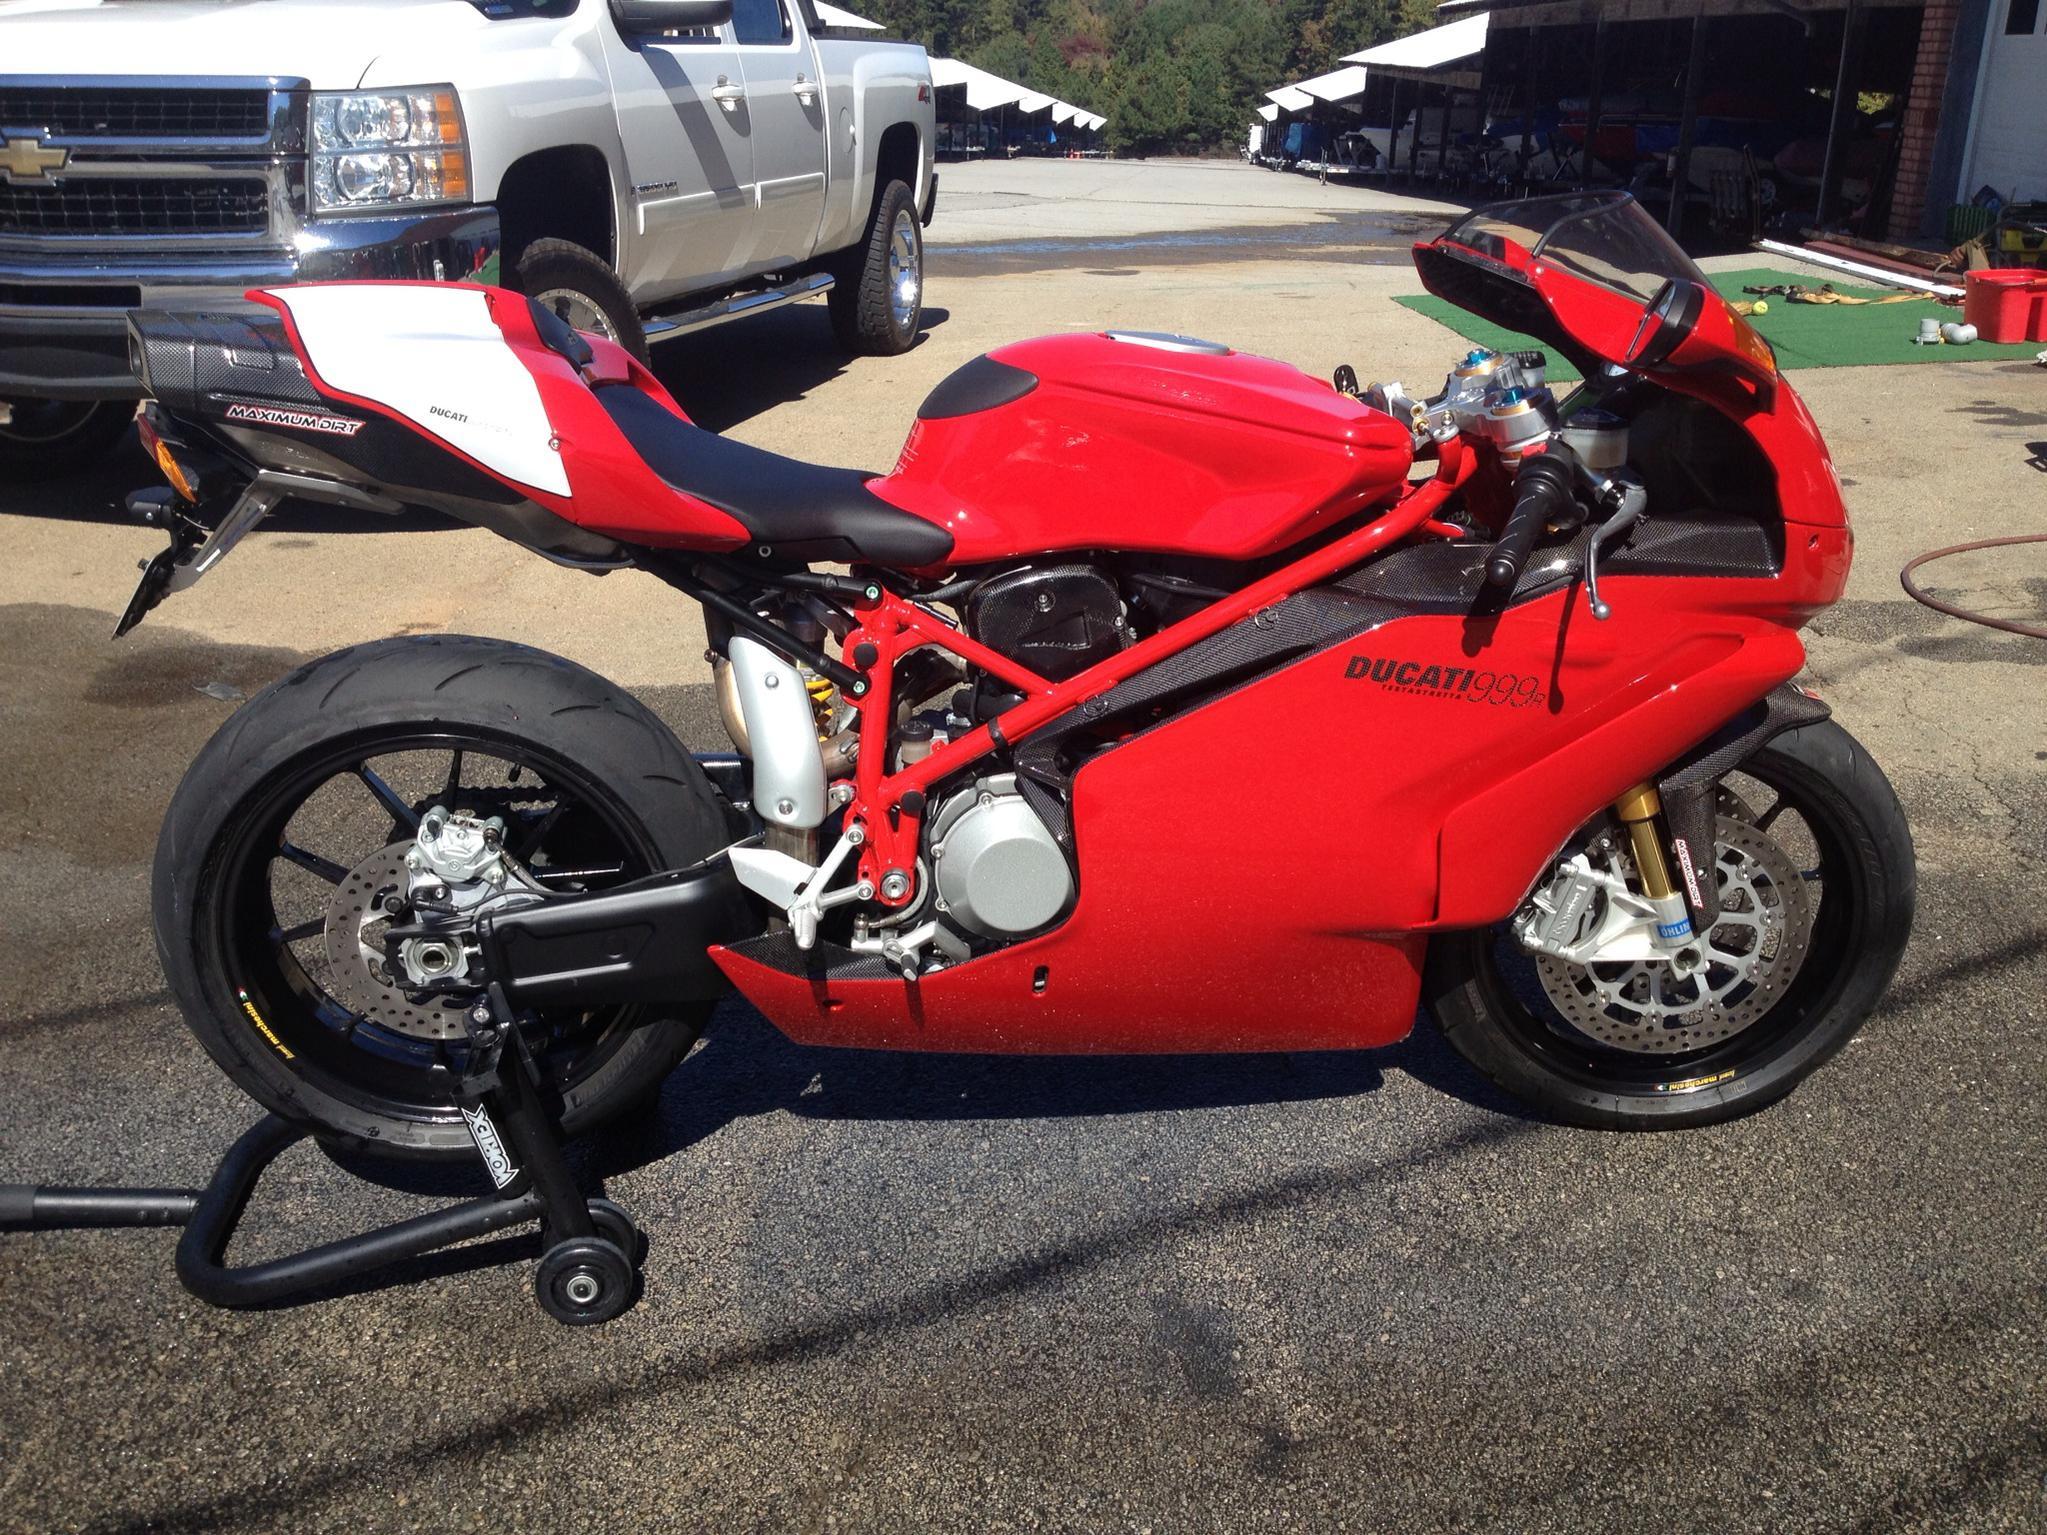 2005 ducati 999r superbike for sale $16,500 - ducati forum